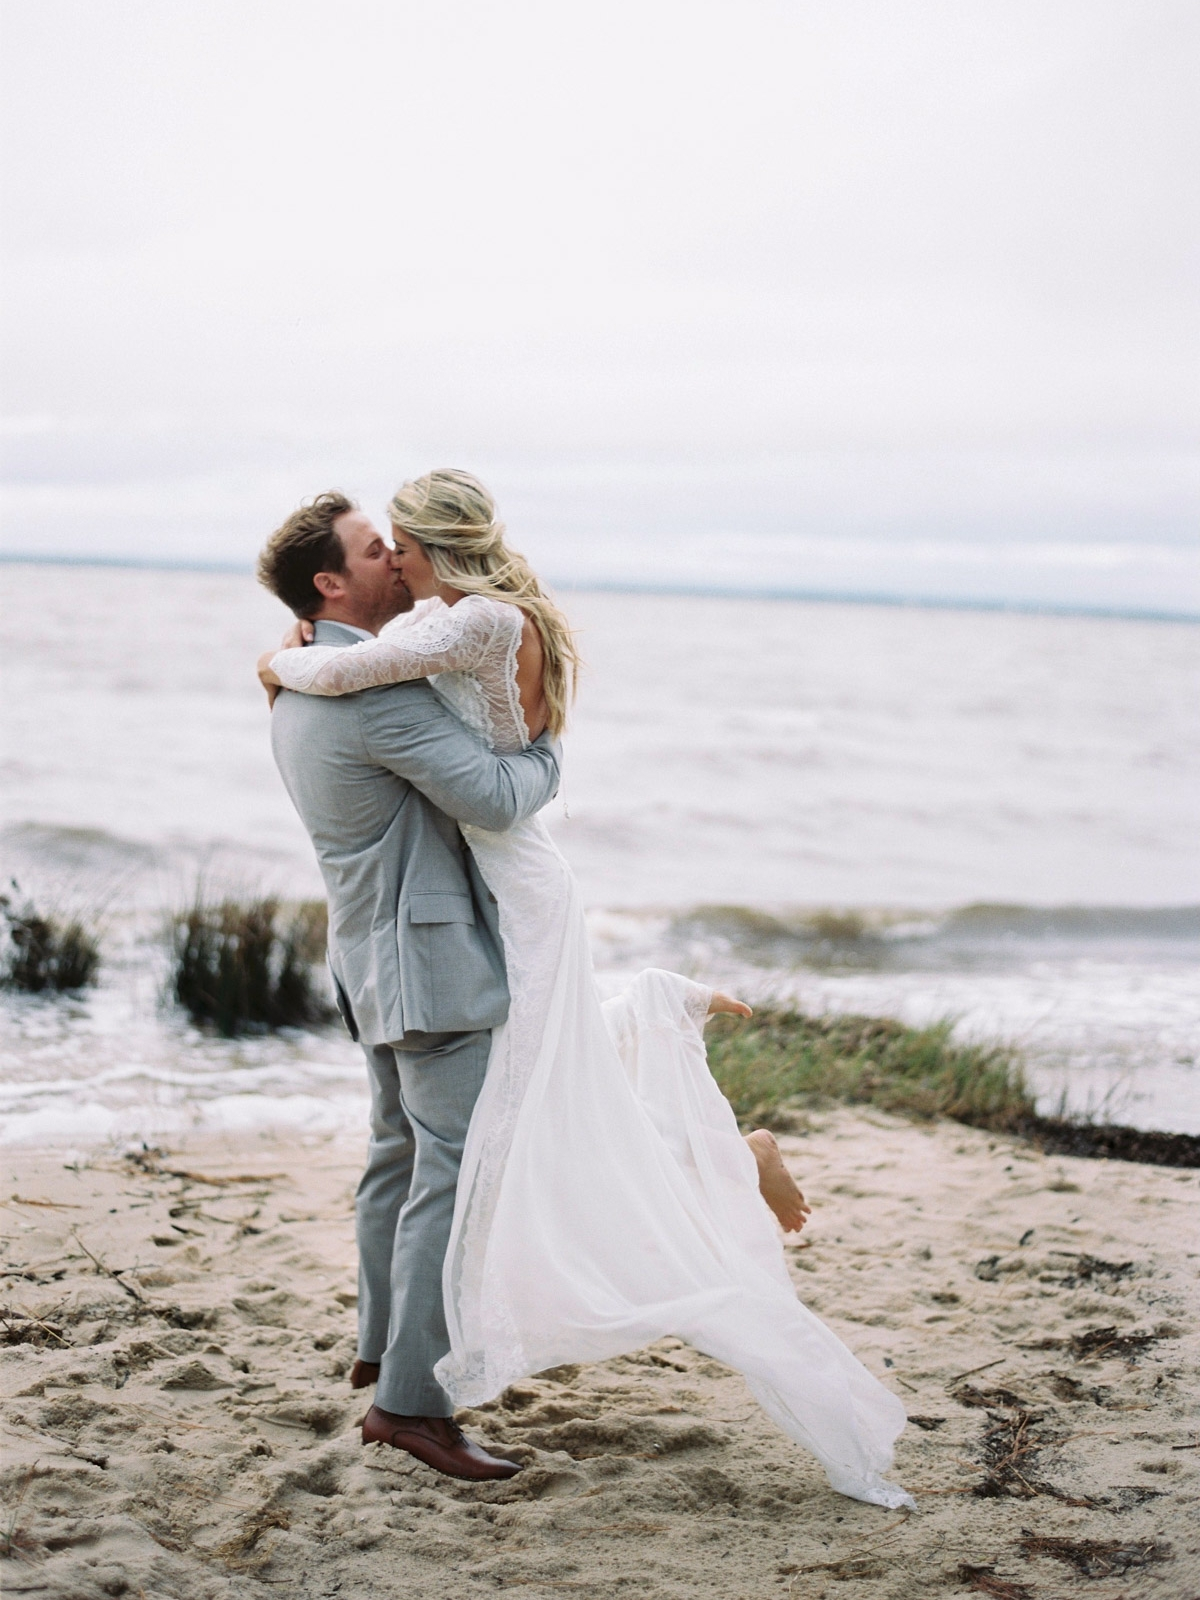 GREEN WEDDING SHOES ...boho chic, barefoot brides